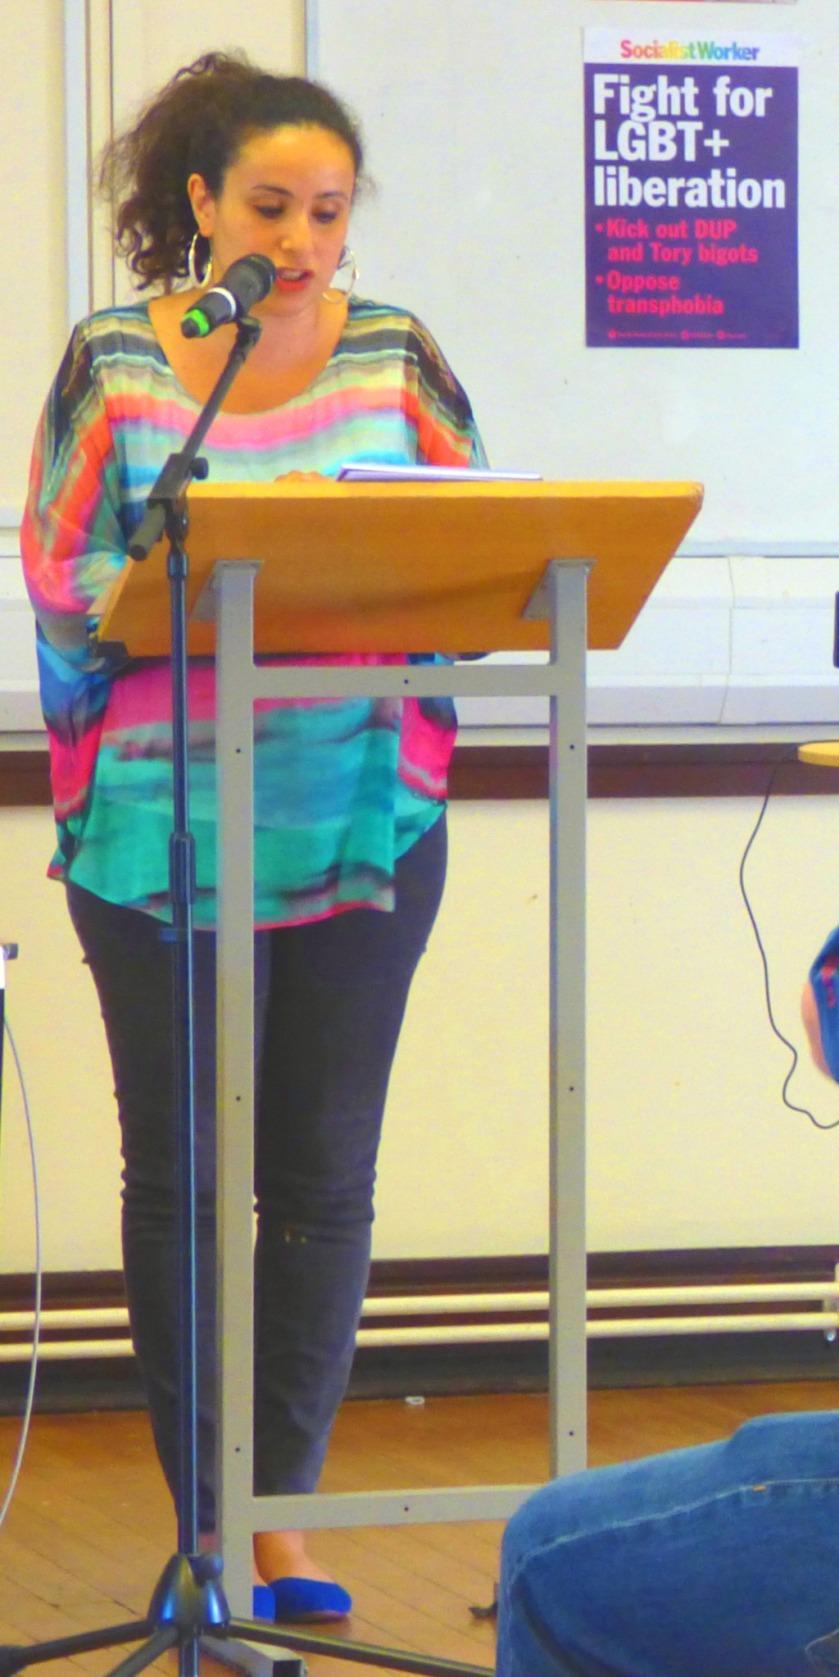 Palestinian biorn lawyer Salma speaks